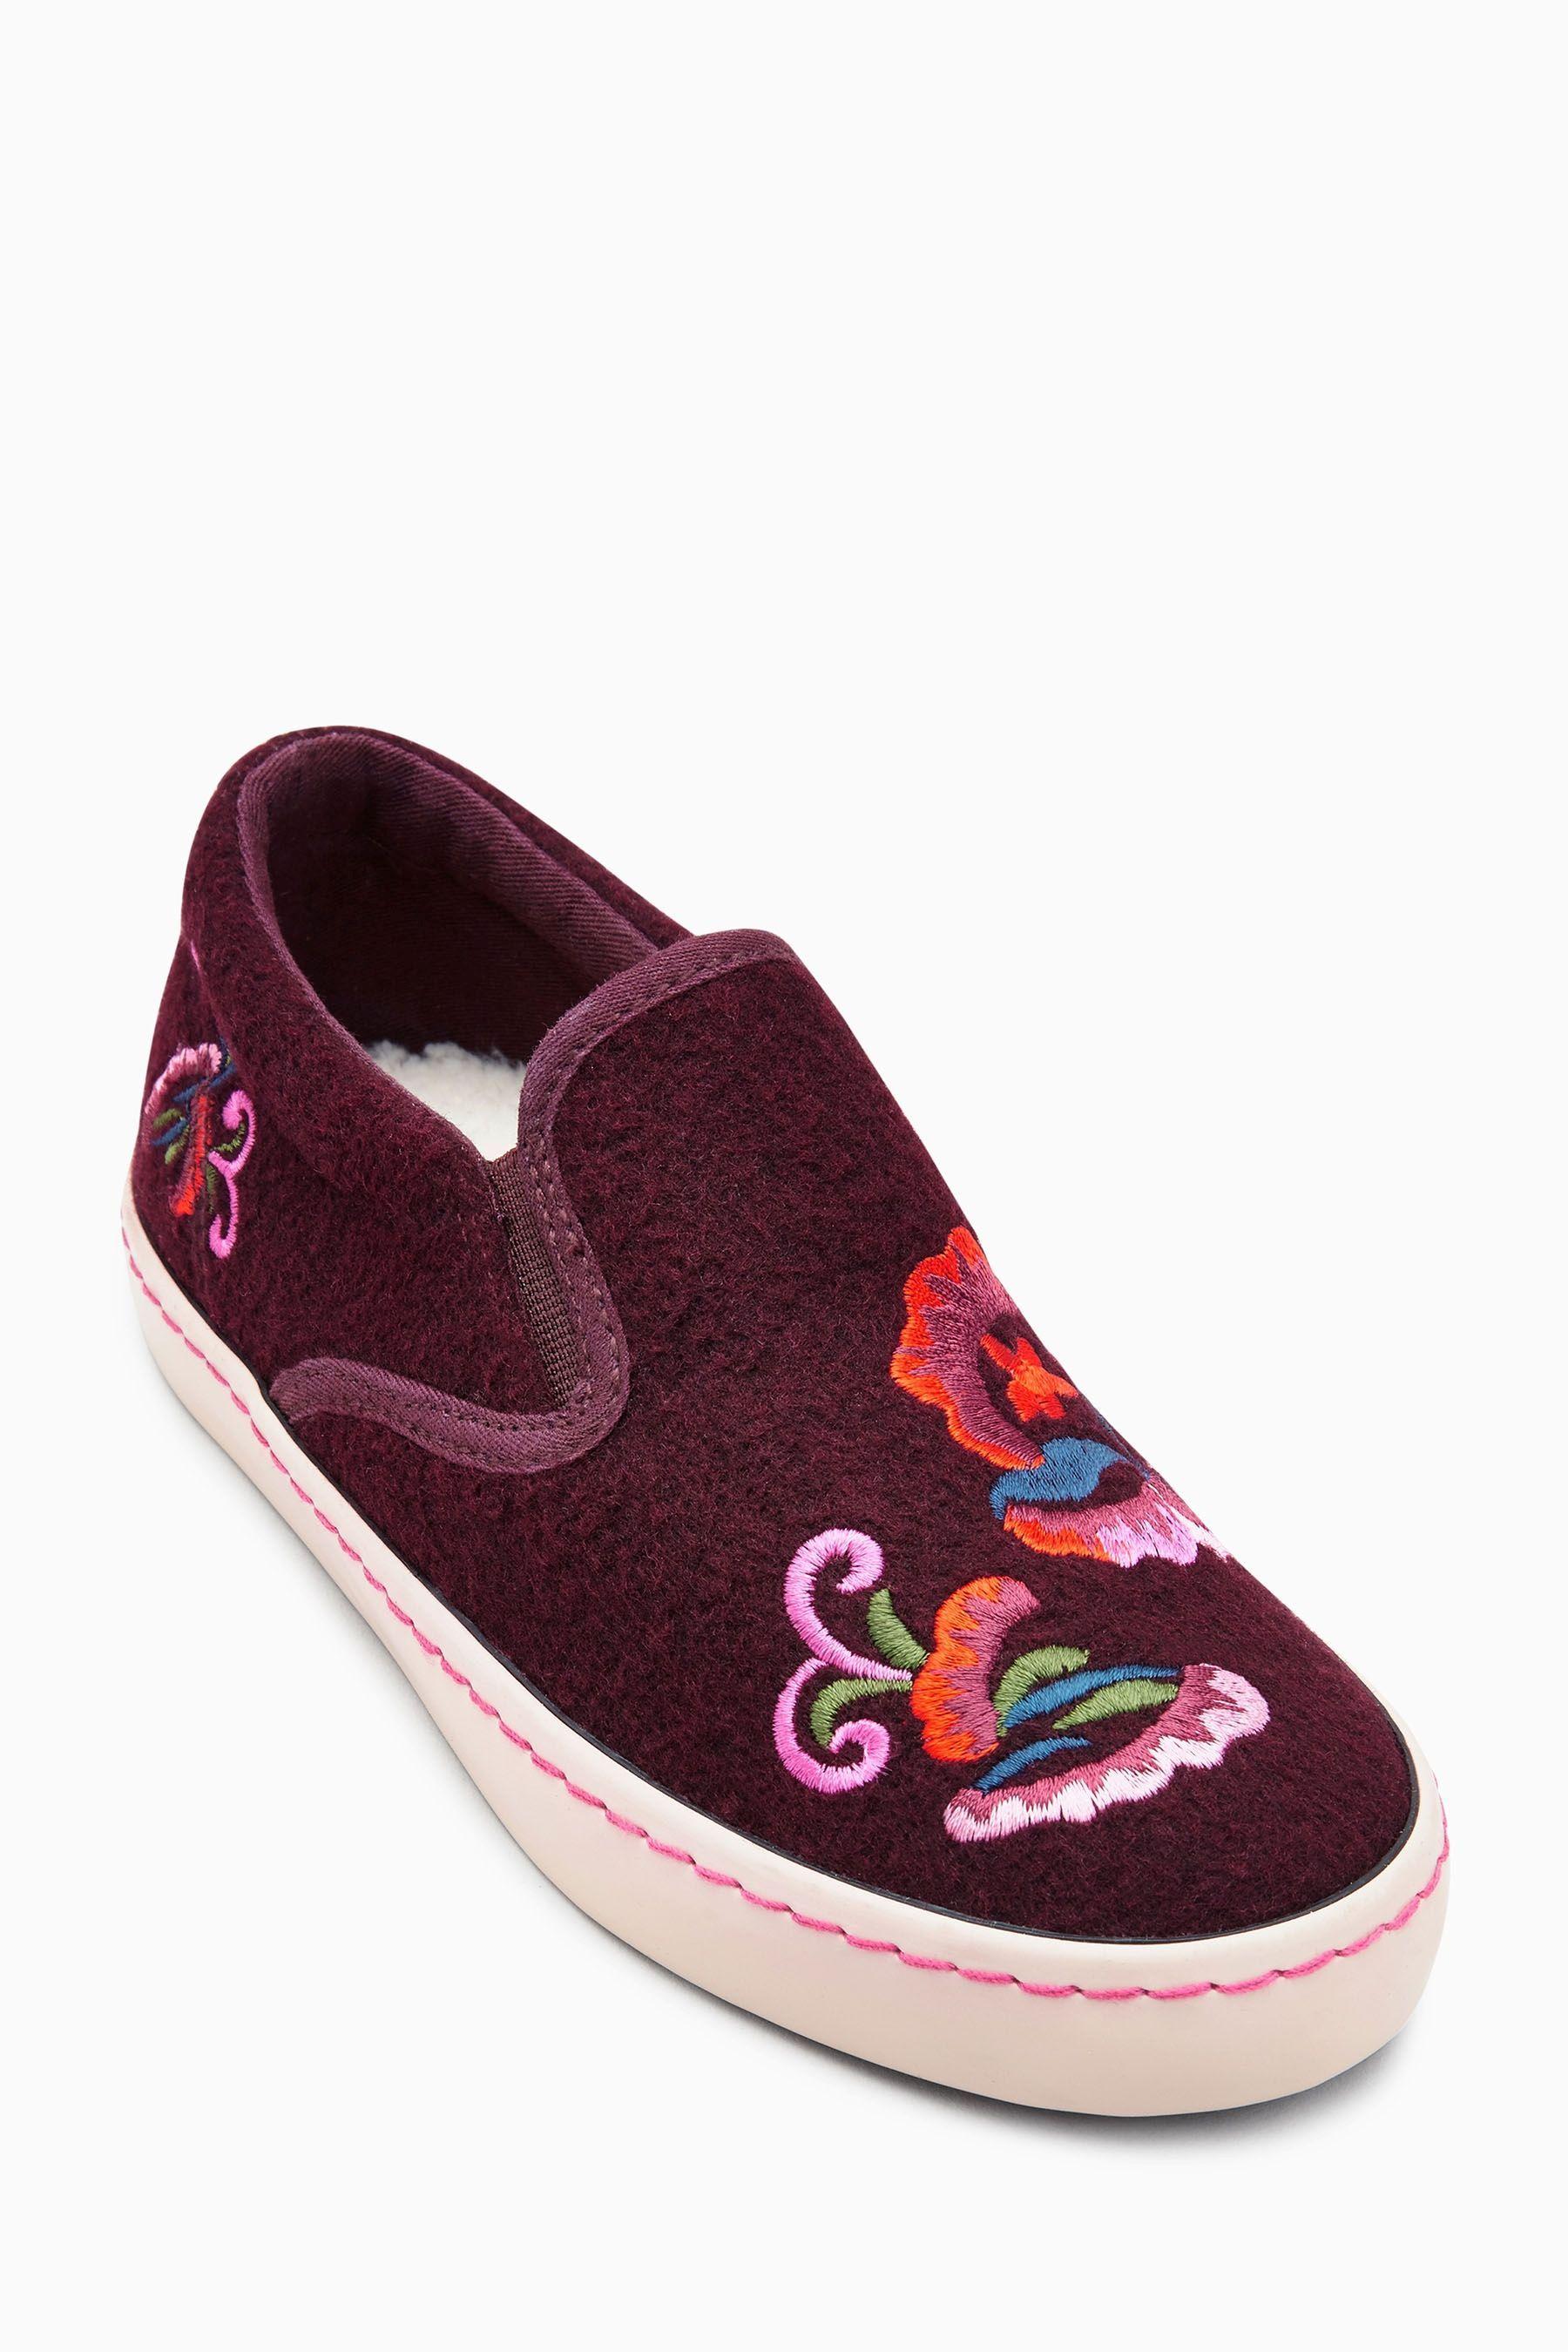 Skate shoes online shop - Buy Berry Embroidered Skate Shoes Older Girls From The Next Uk Online Shop